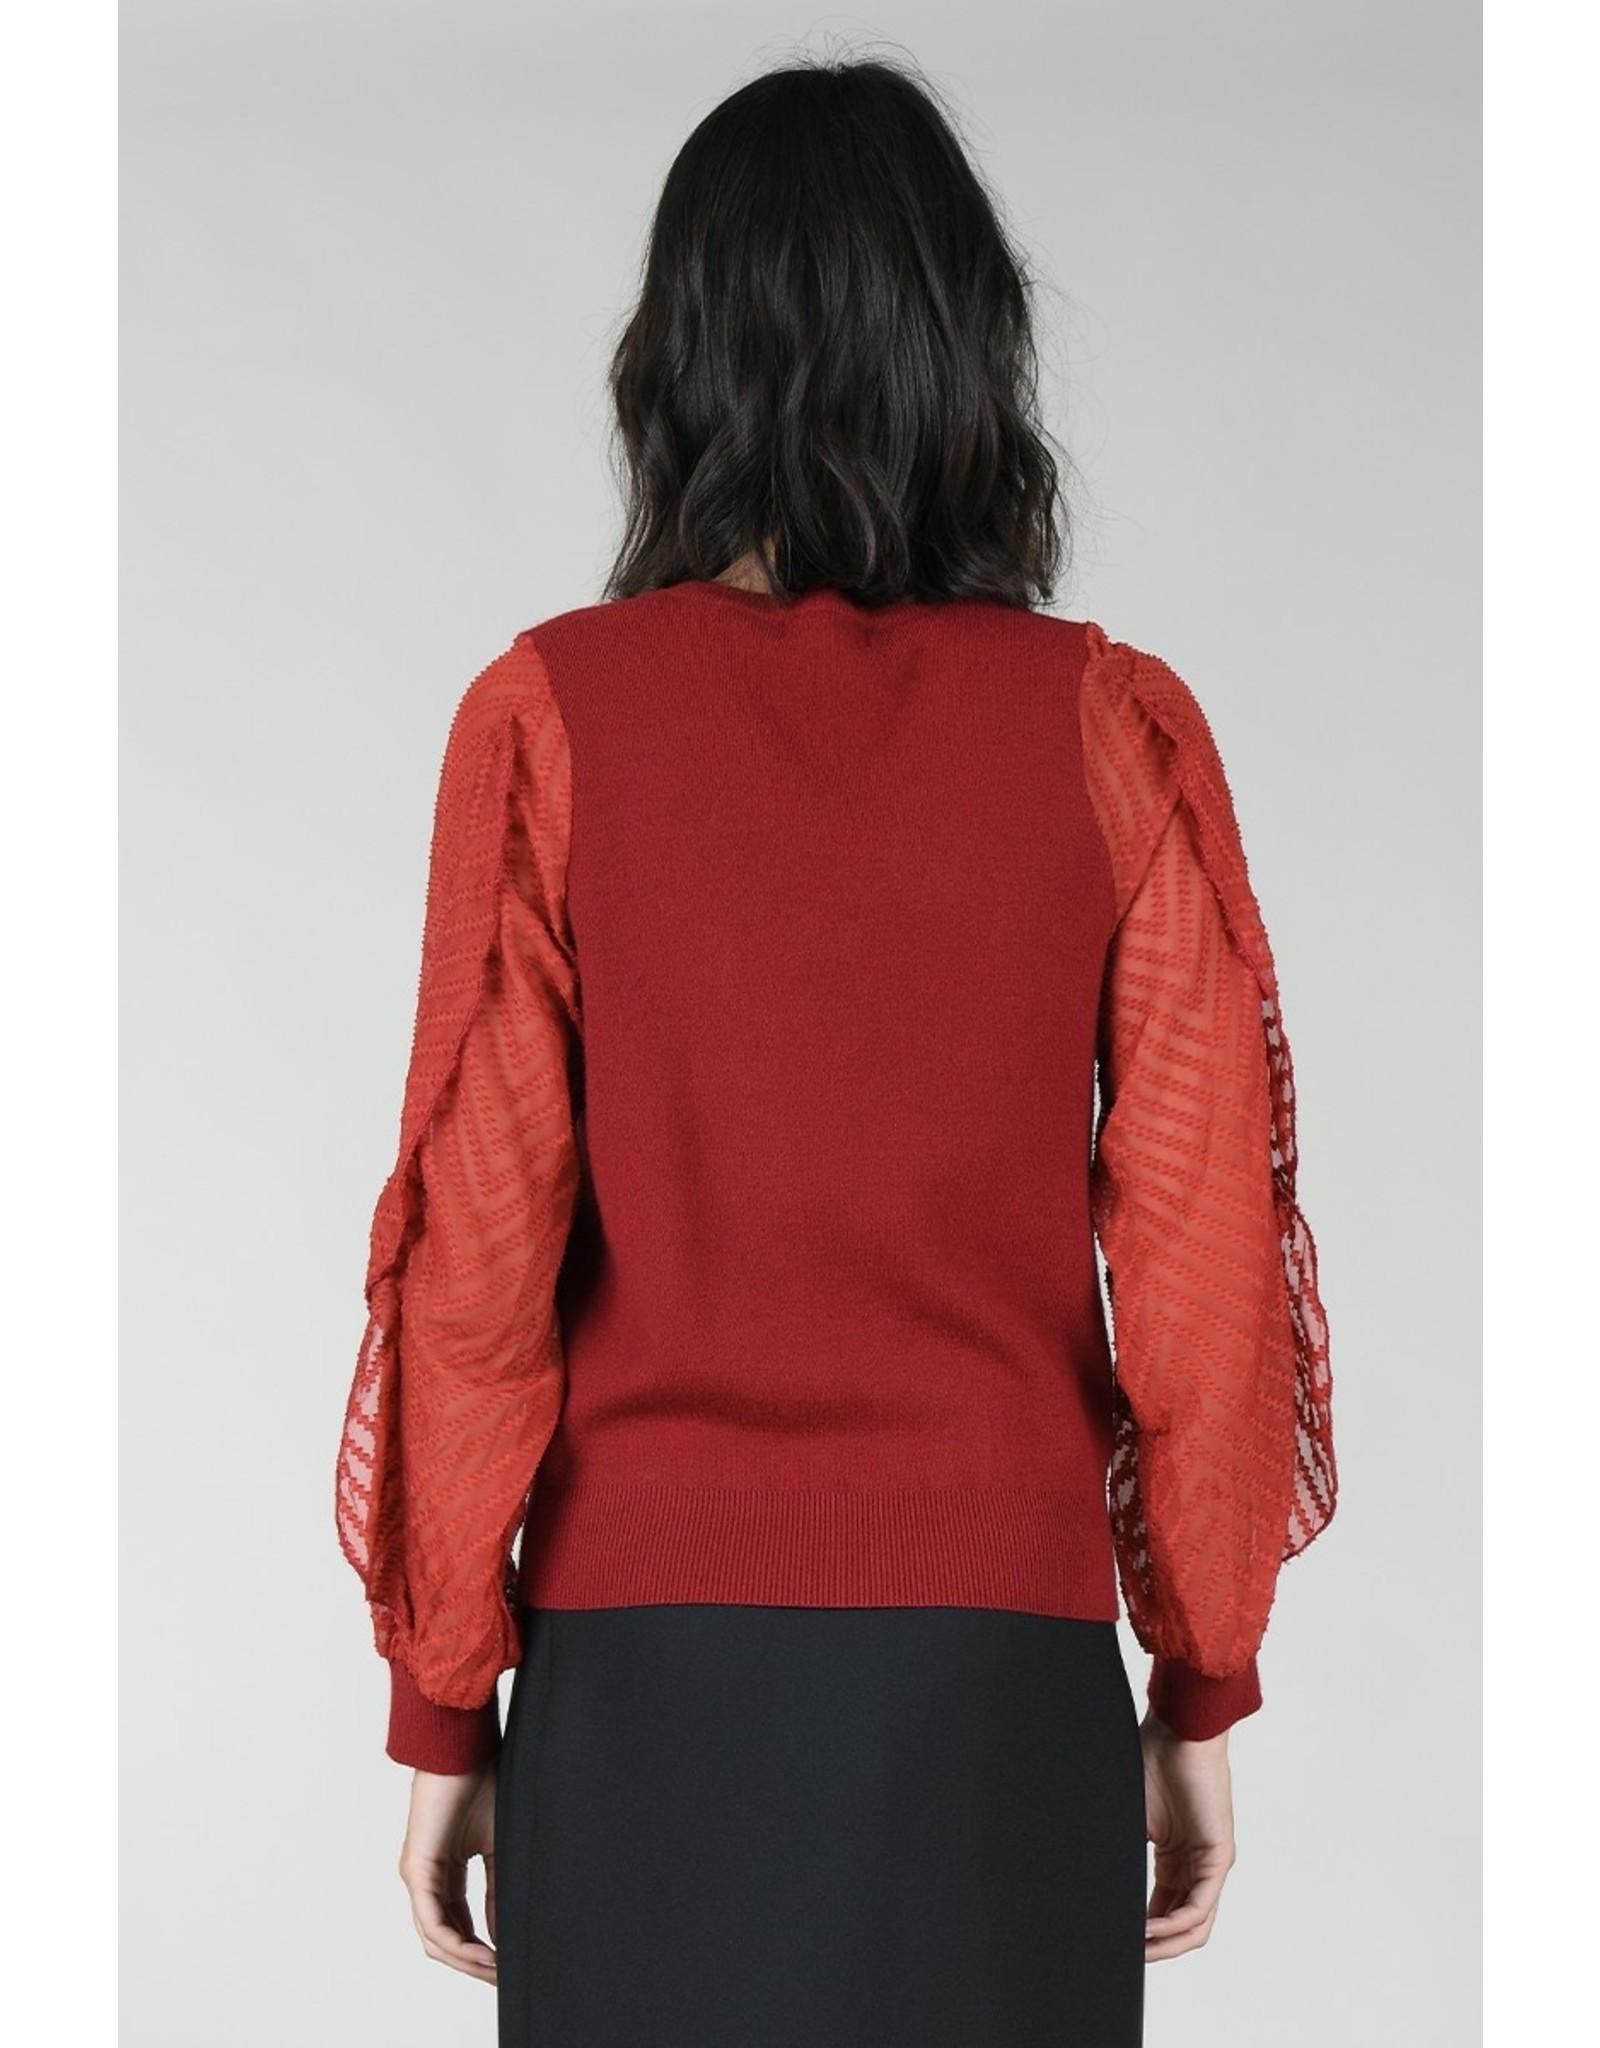 Molly Bracken Molly Bracken - Knit sweater with sheer sleeves (red)